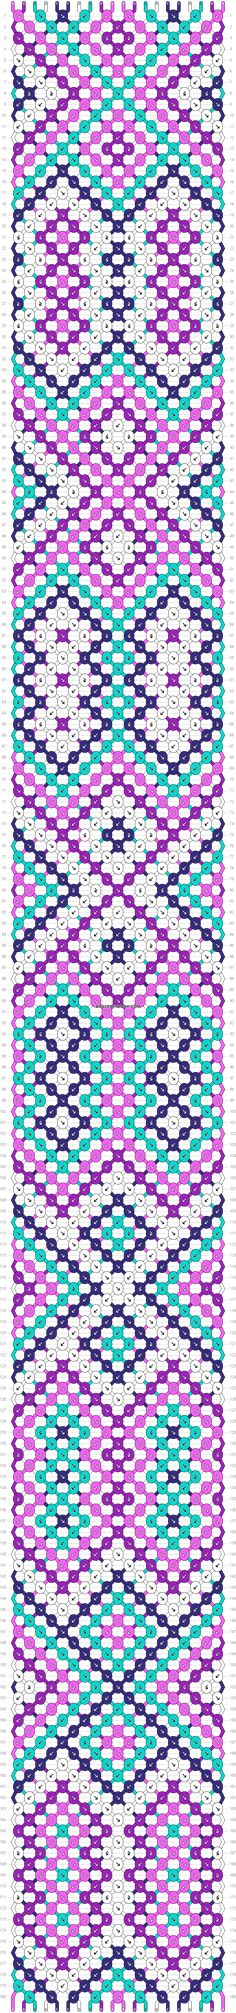 Normal pattern #27716 | BraceletBook